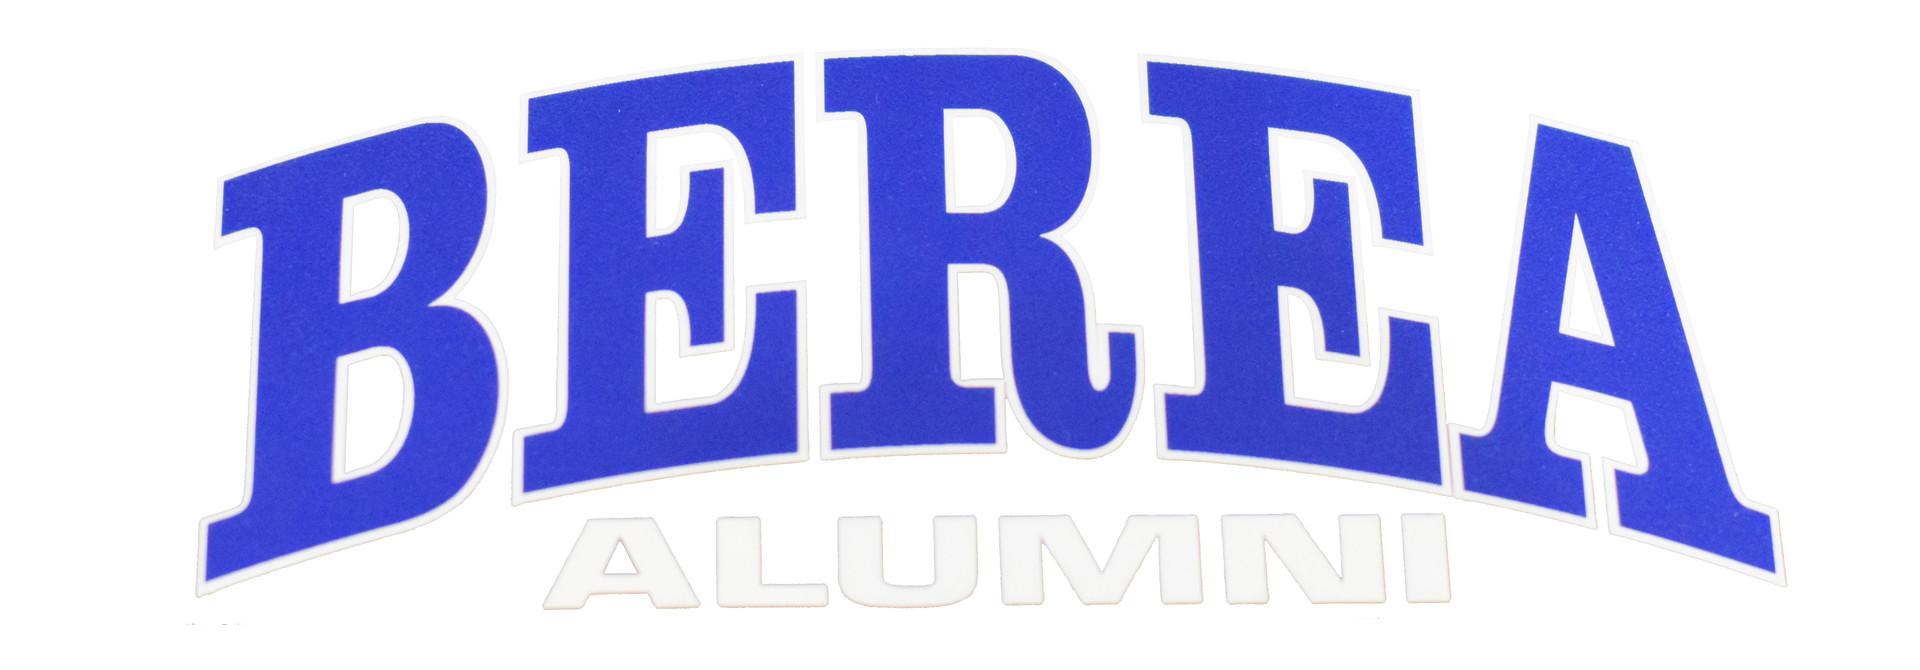 Berea Alumni Decal